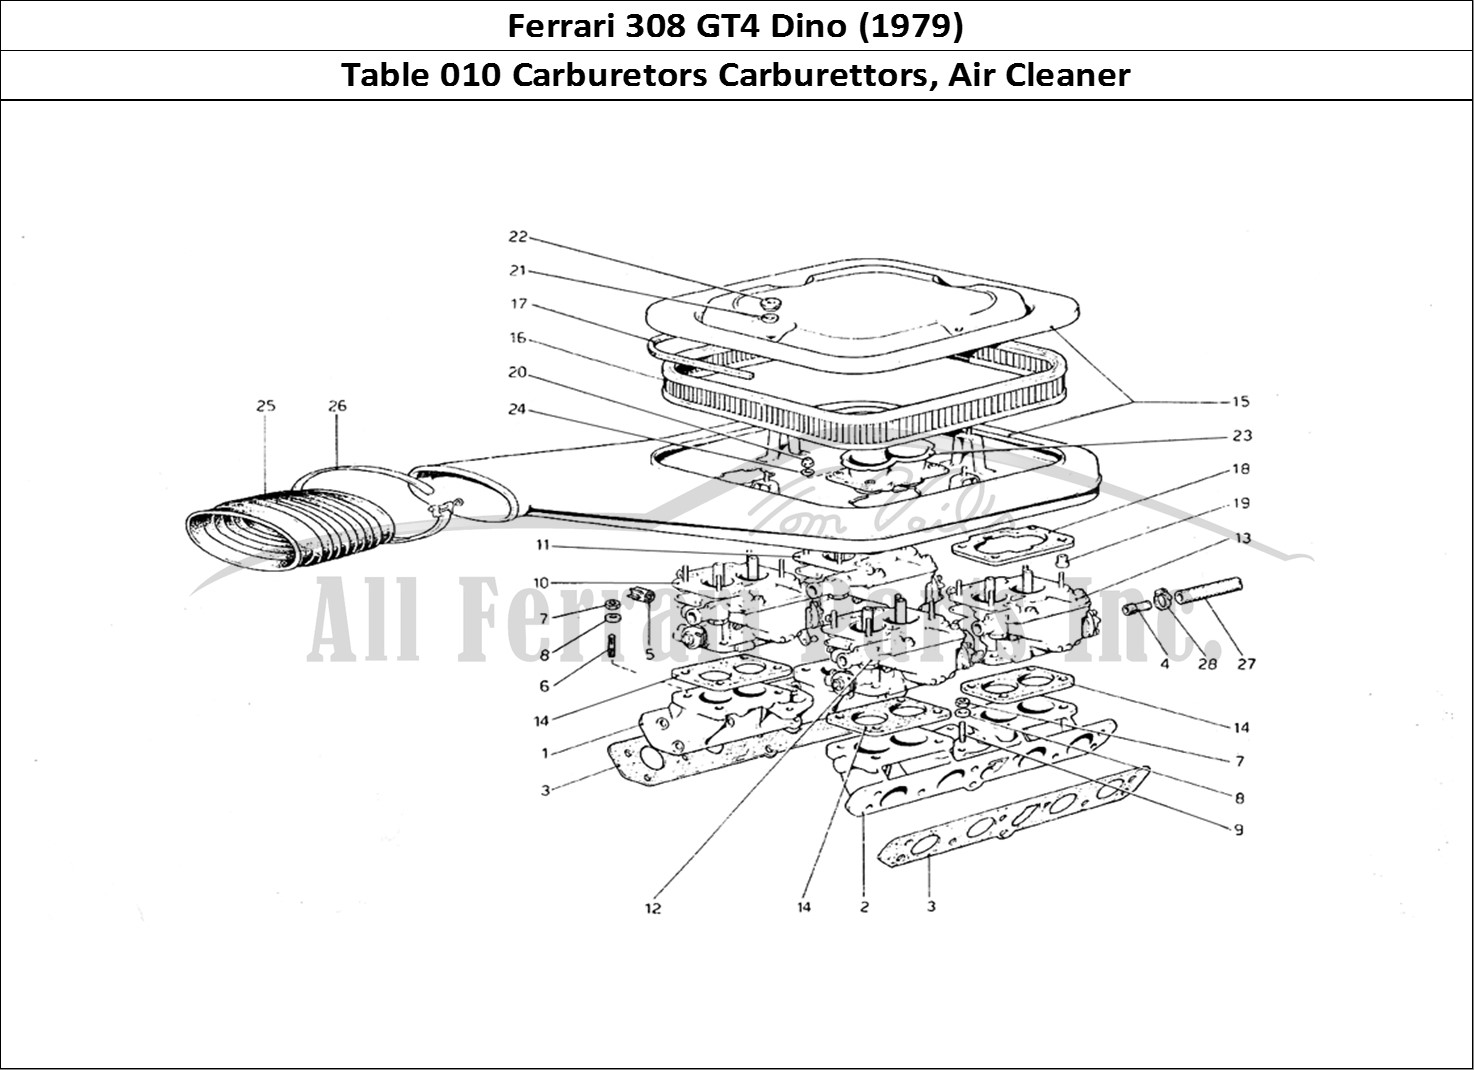 Buy original Ferrari 308 GT4 Dino (1979) 010 Carburetors